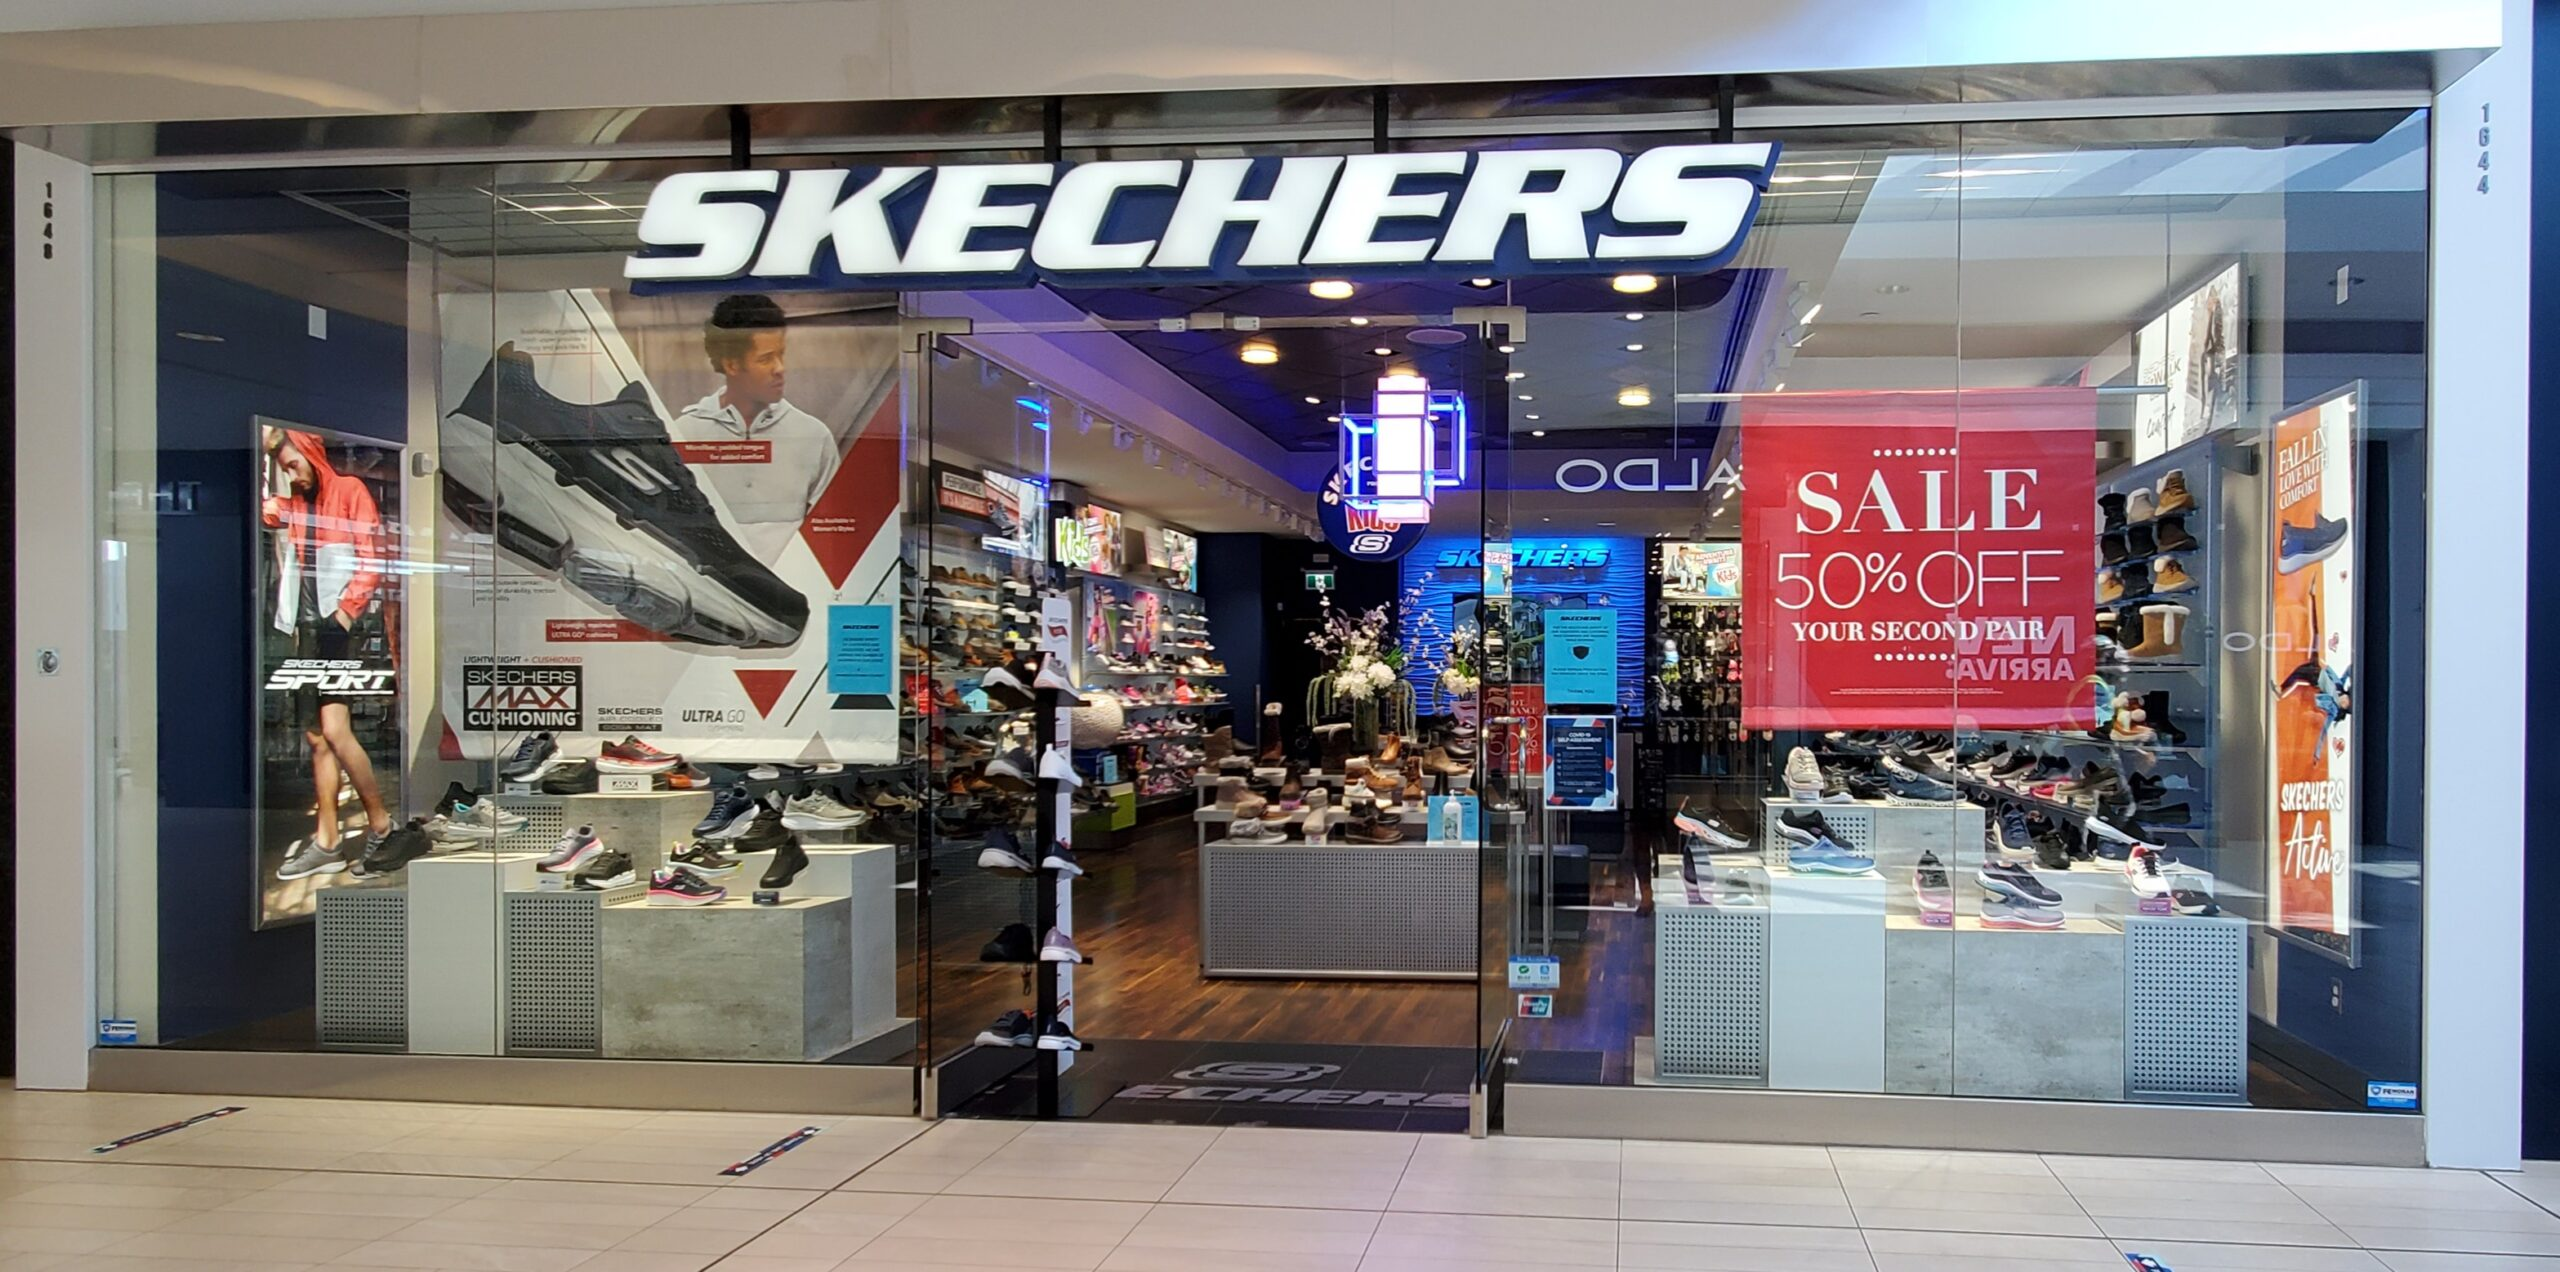 Skechers Shoes at CF Richmond Centre